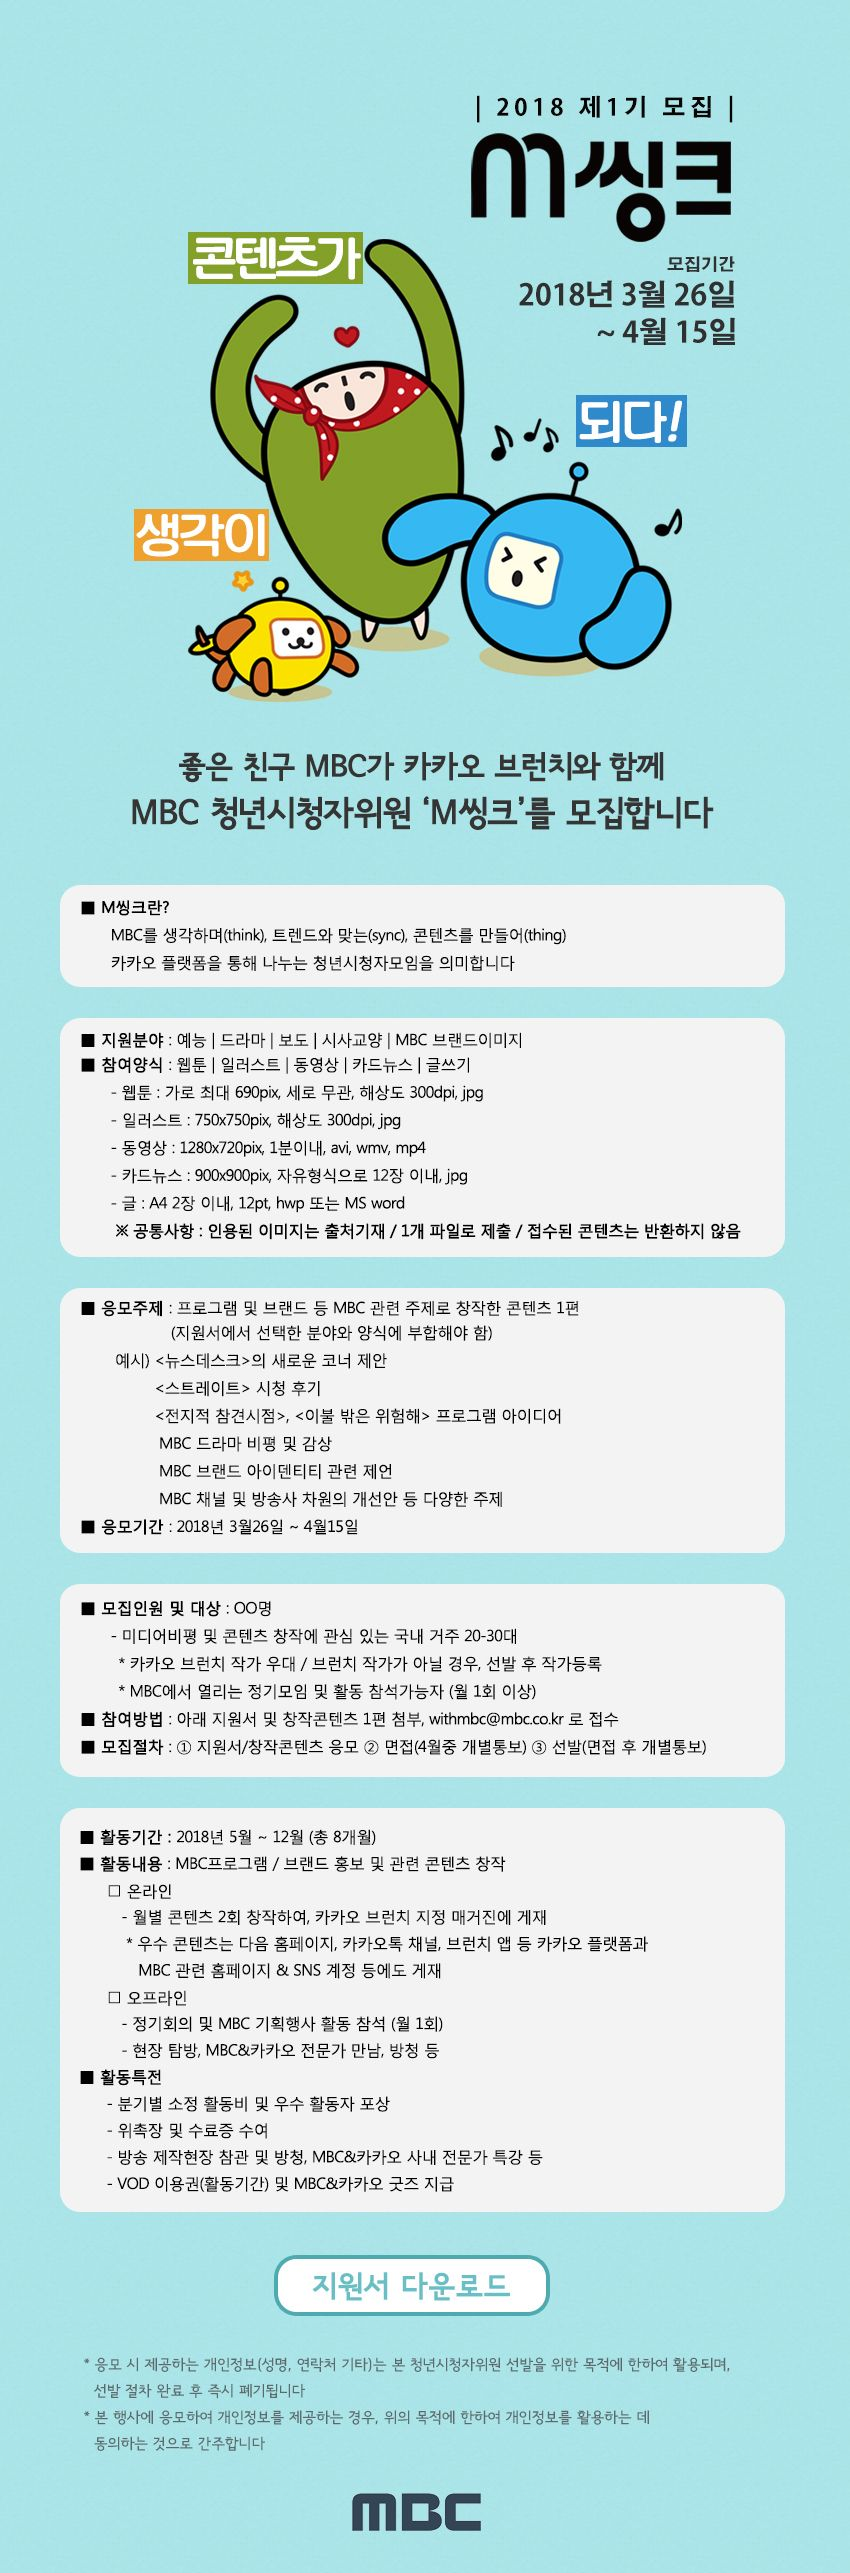 MBC 청년시청자위원회 M씽크 모집